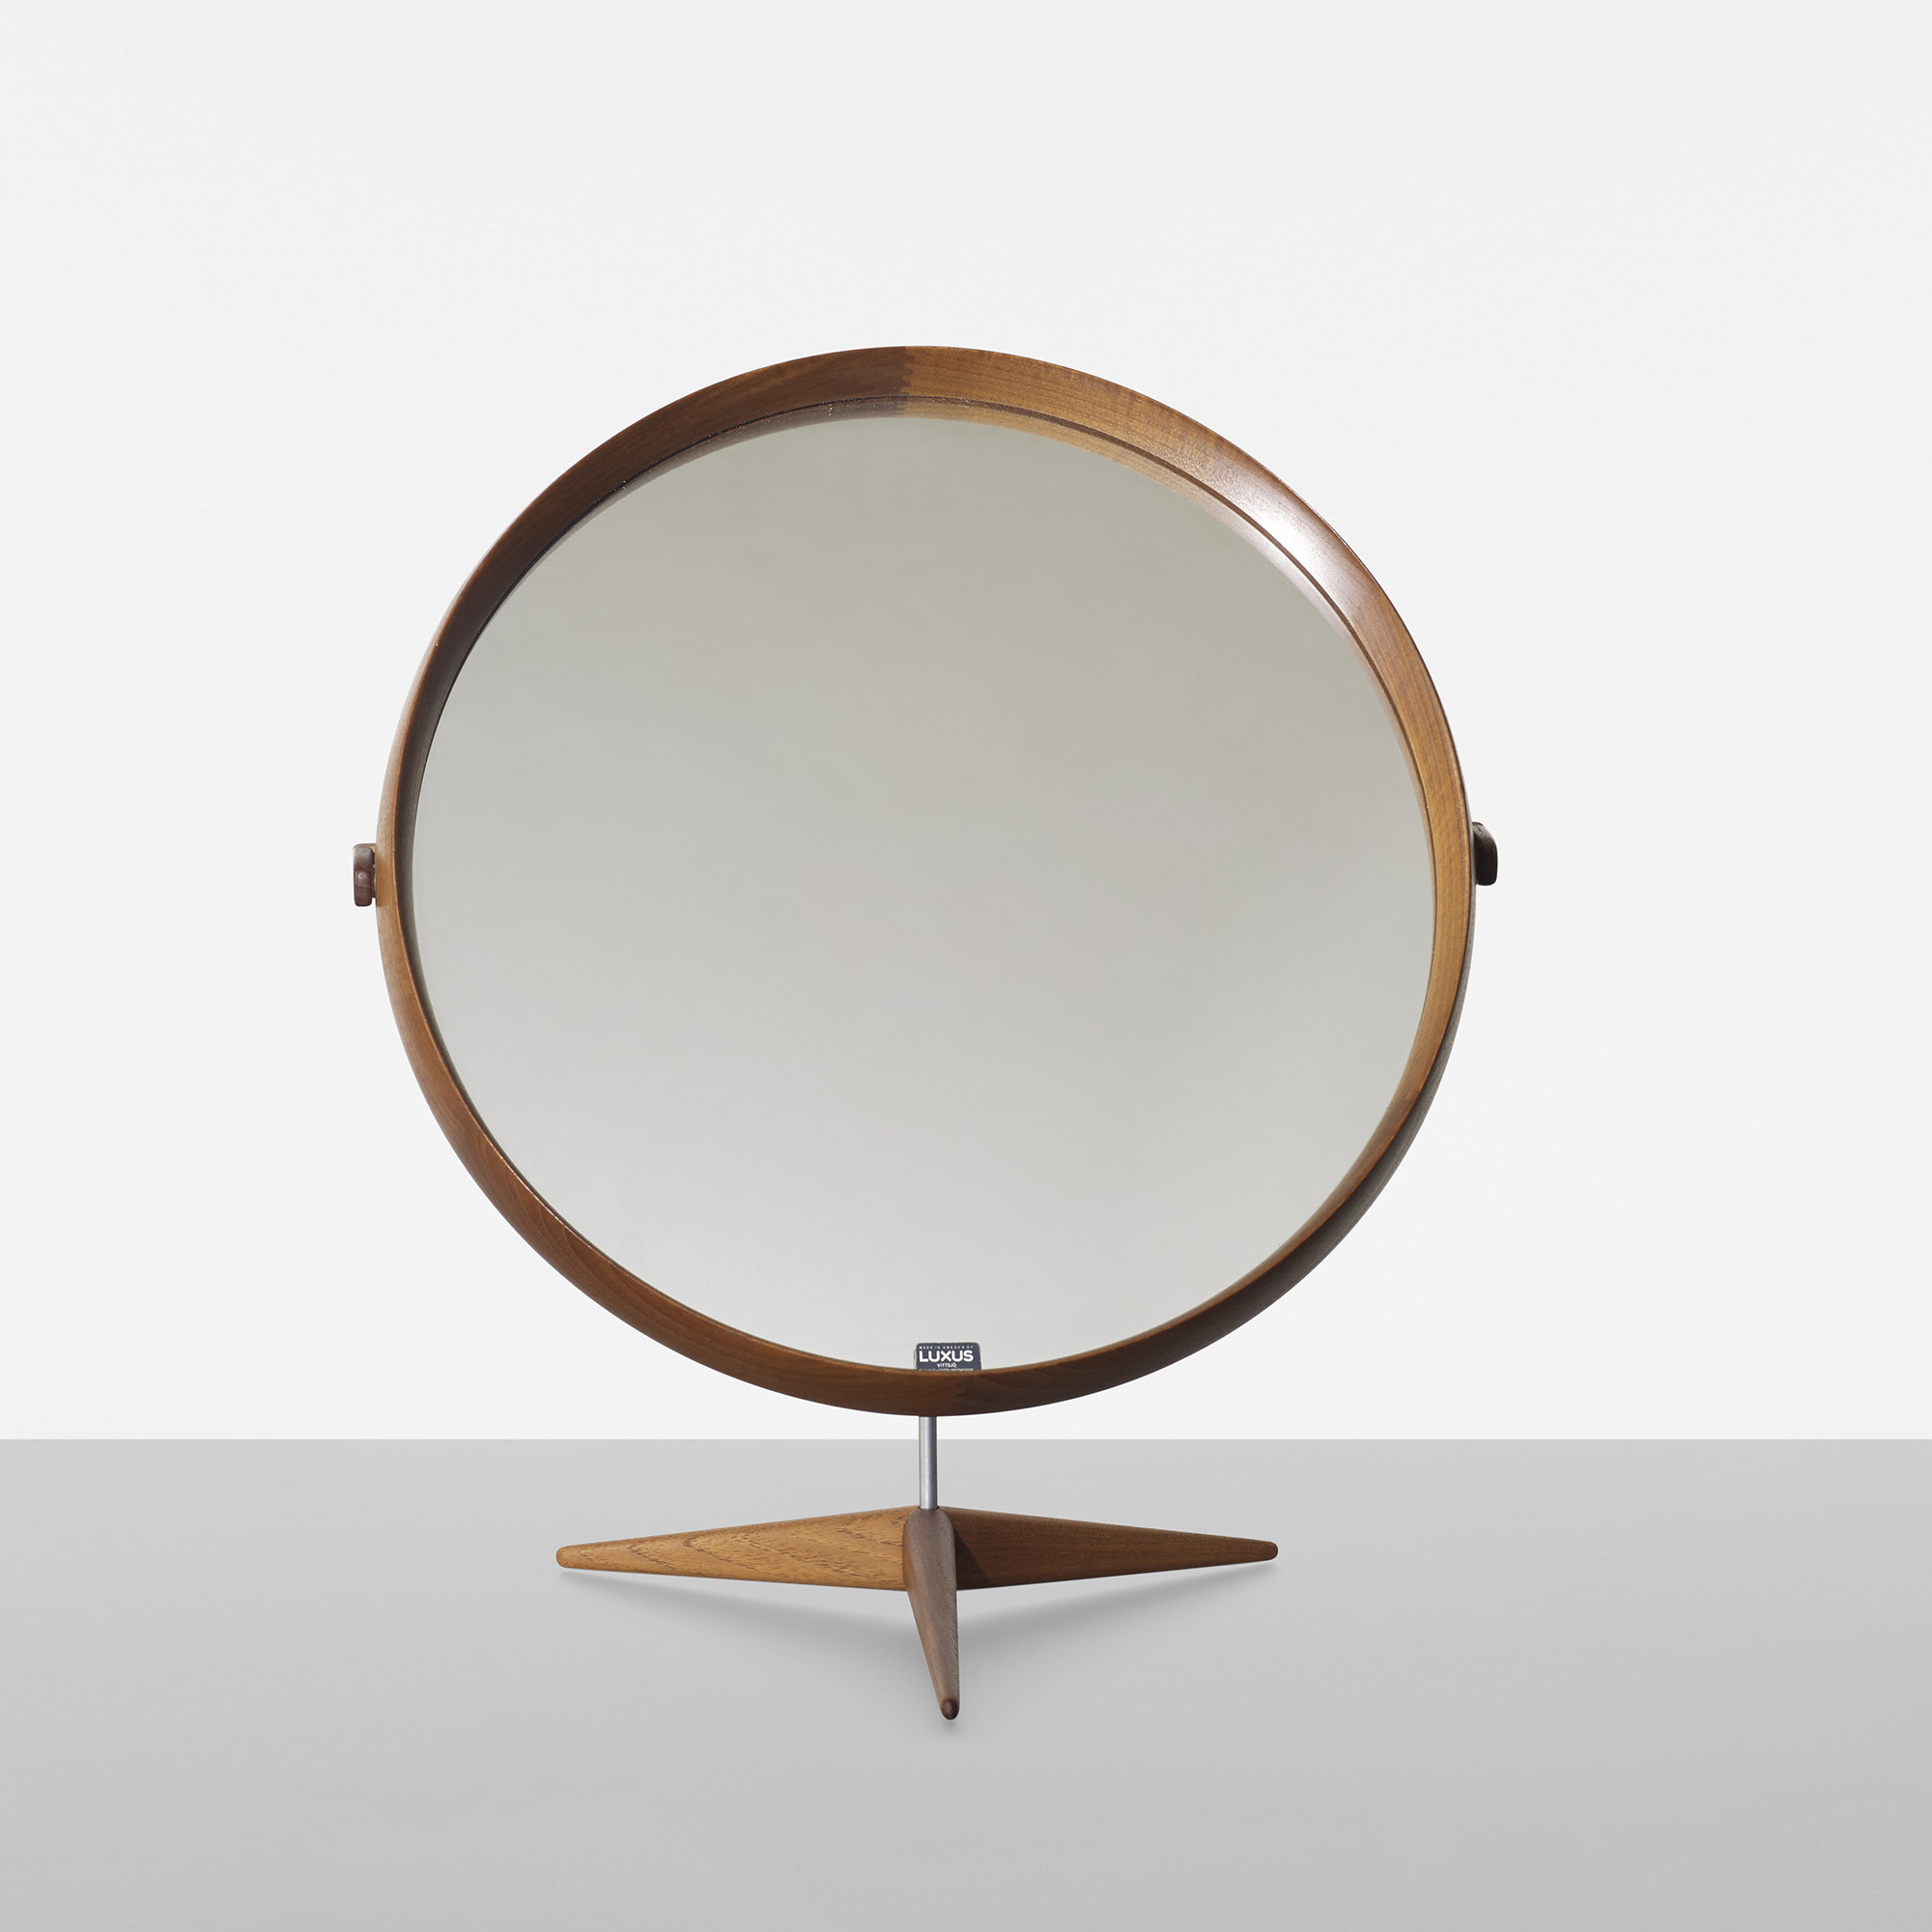 149: Uno and Östen Kristiansson / mirror (2 of 5)